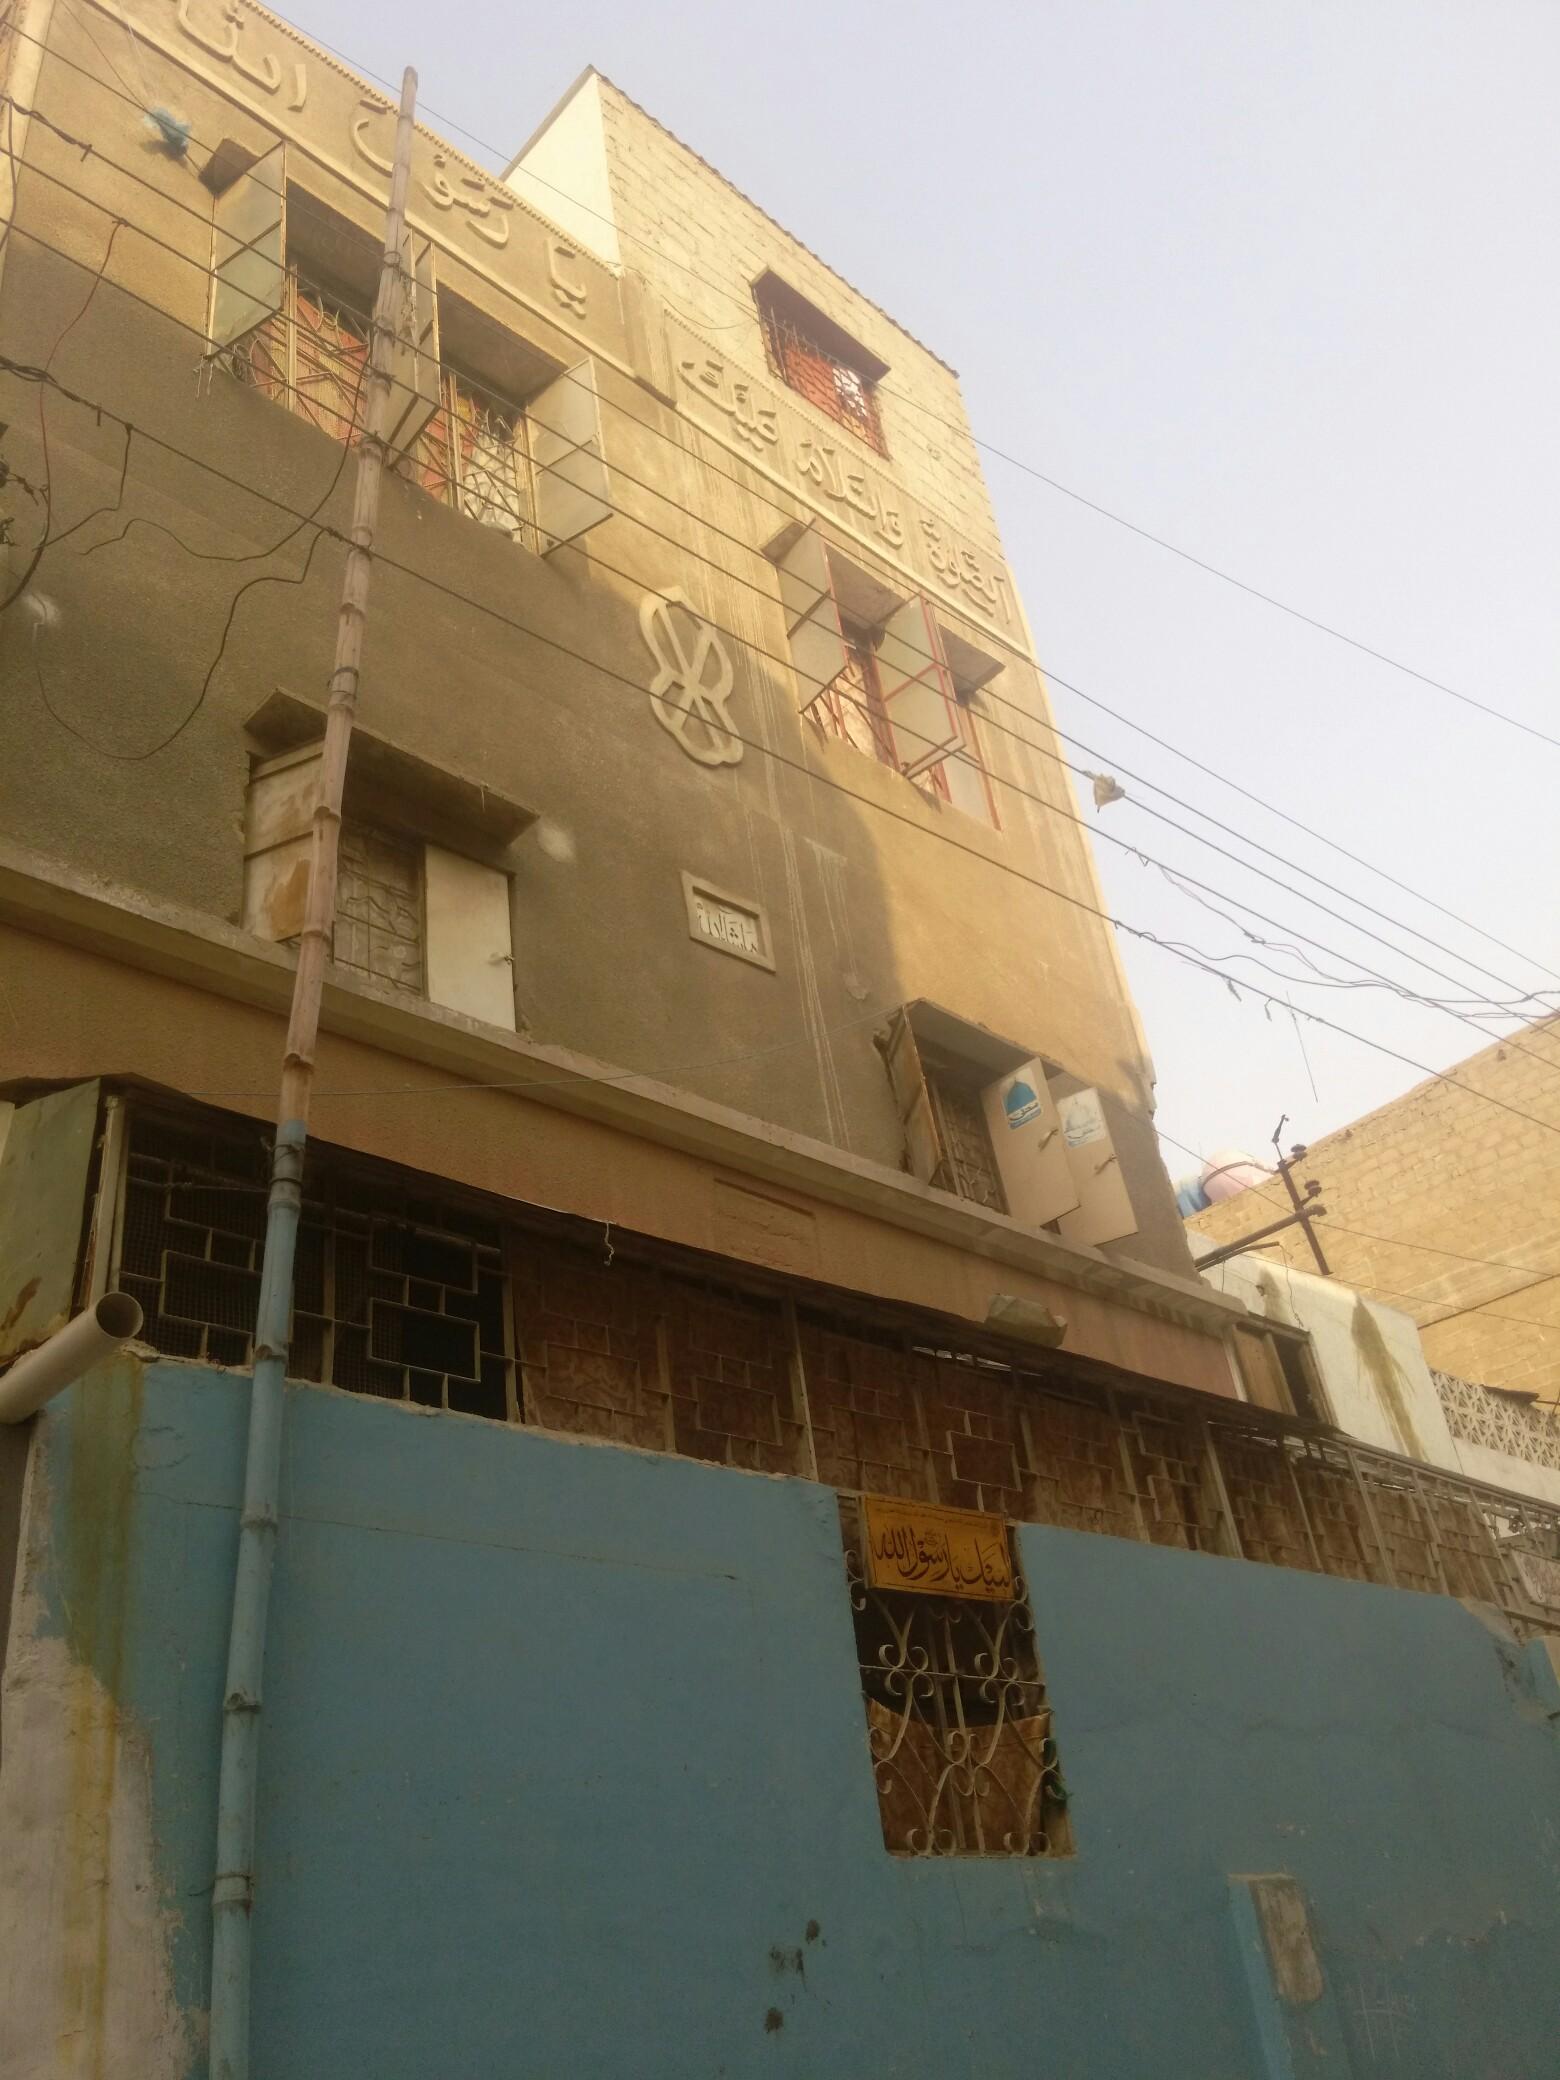 80 SQ/YARD HOUSE FOR SALE C-1 AREA LIAQATABAD